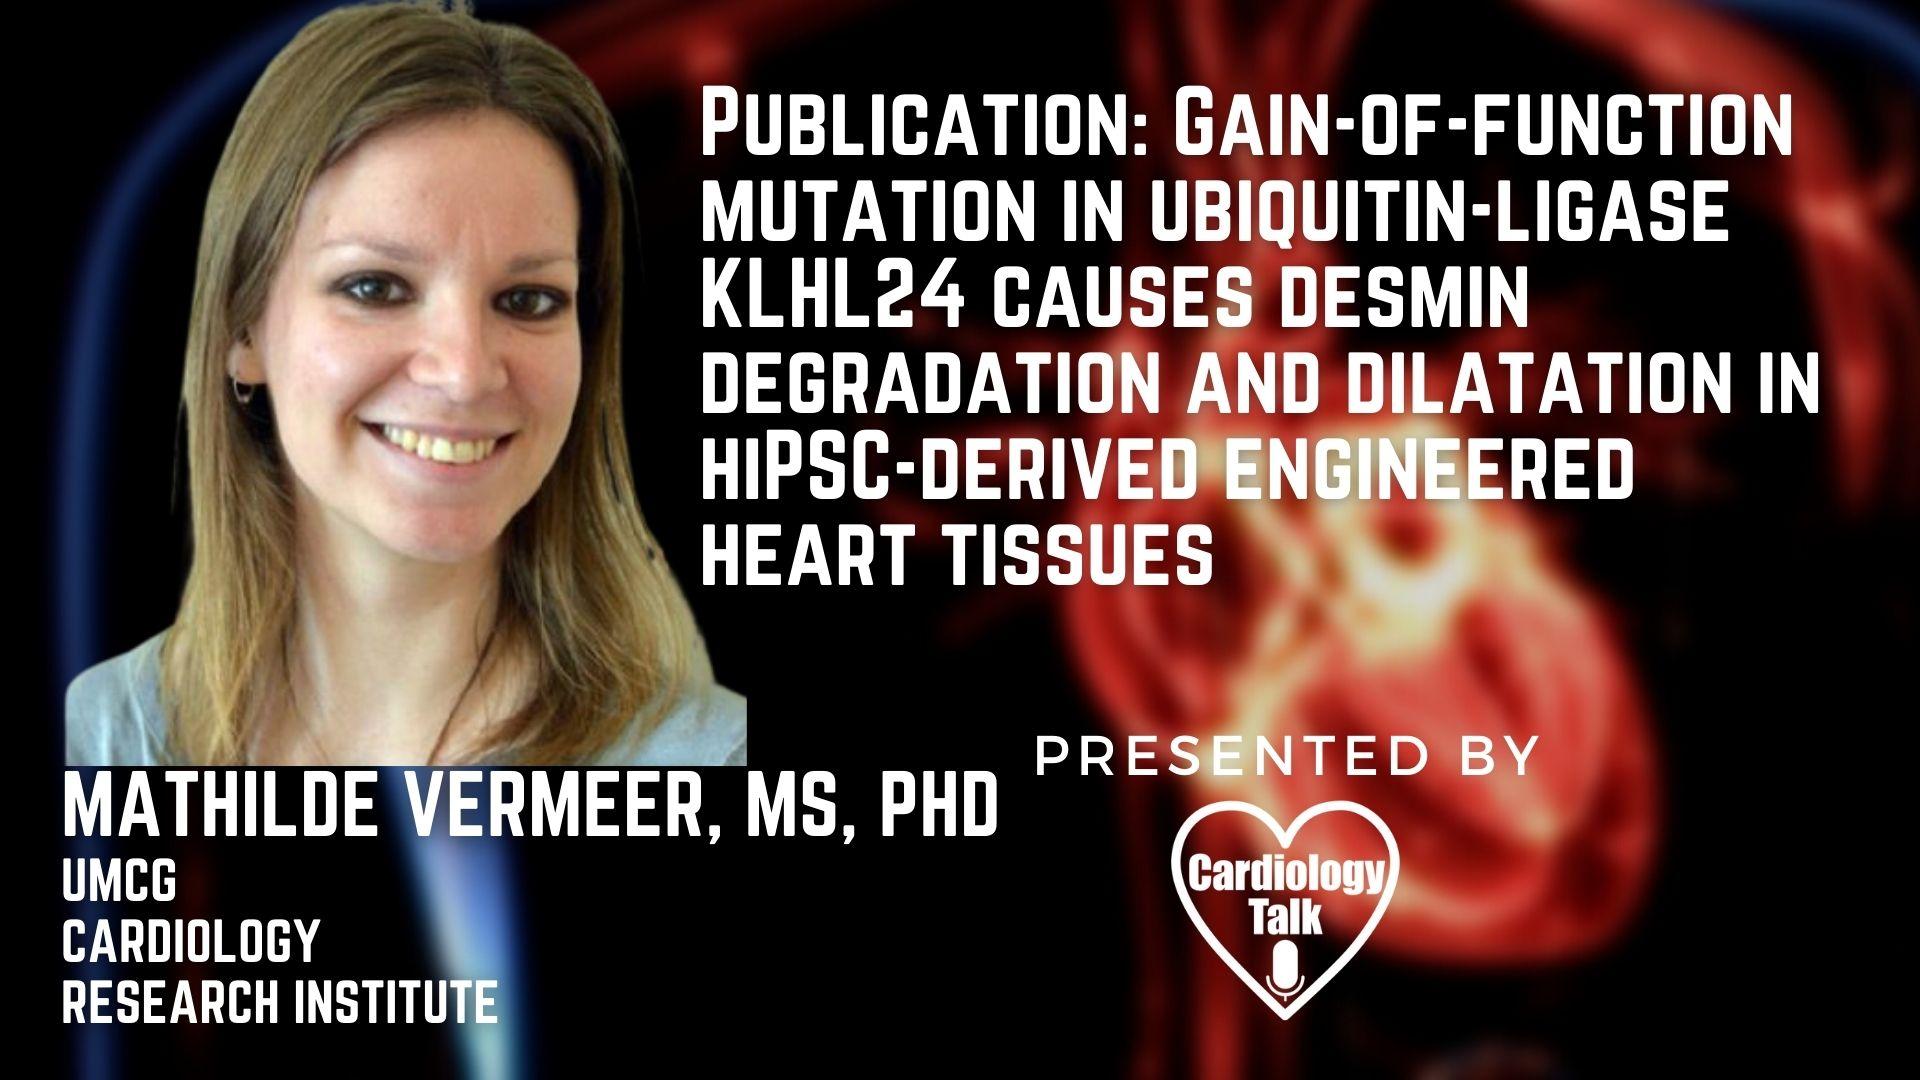 Mathilde Vermeer, MS @CardiologyUmcg @p_van_der_meer @RegenBio @cmu_bme @mariekebolling @HijackSciJac #EngineeredHeartTissue #JournalofClinicalInvestigation #Cardiology #Research Publicat...